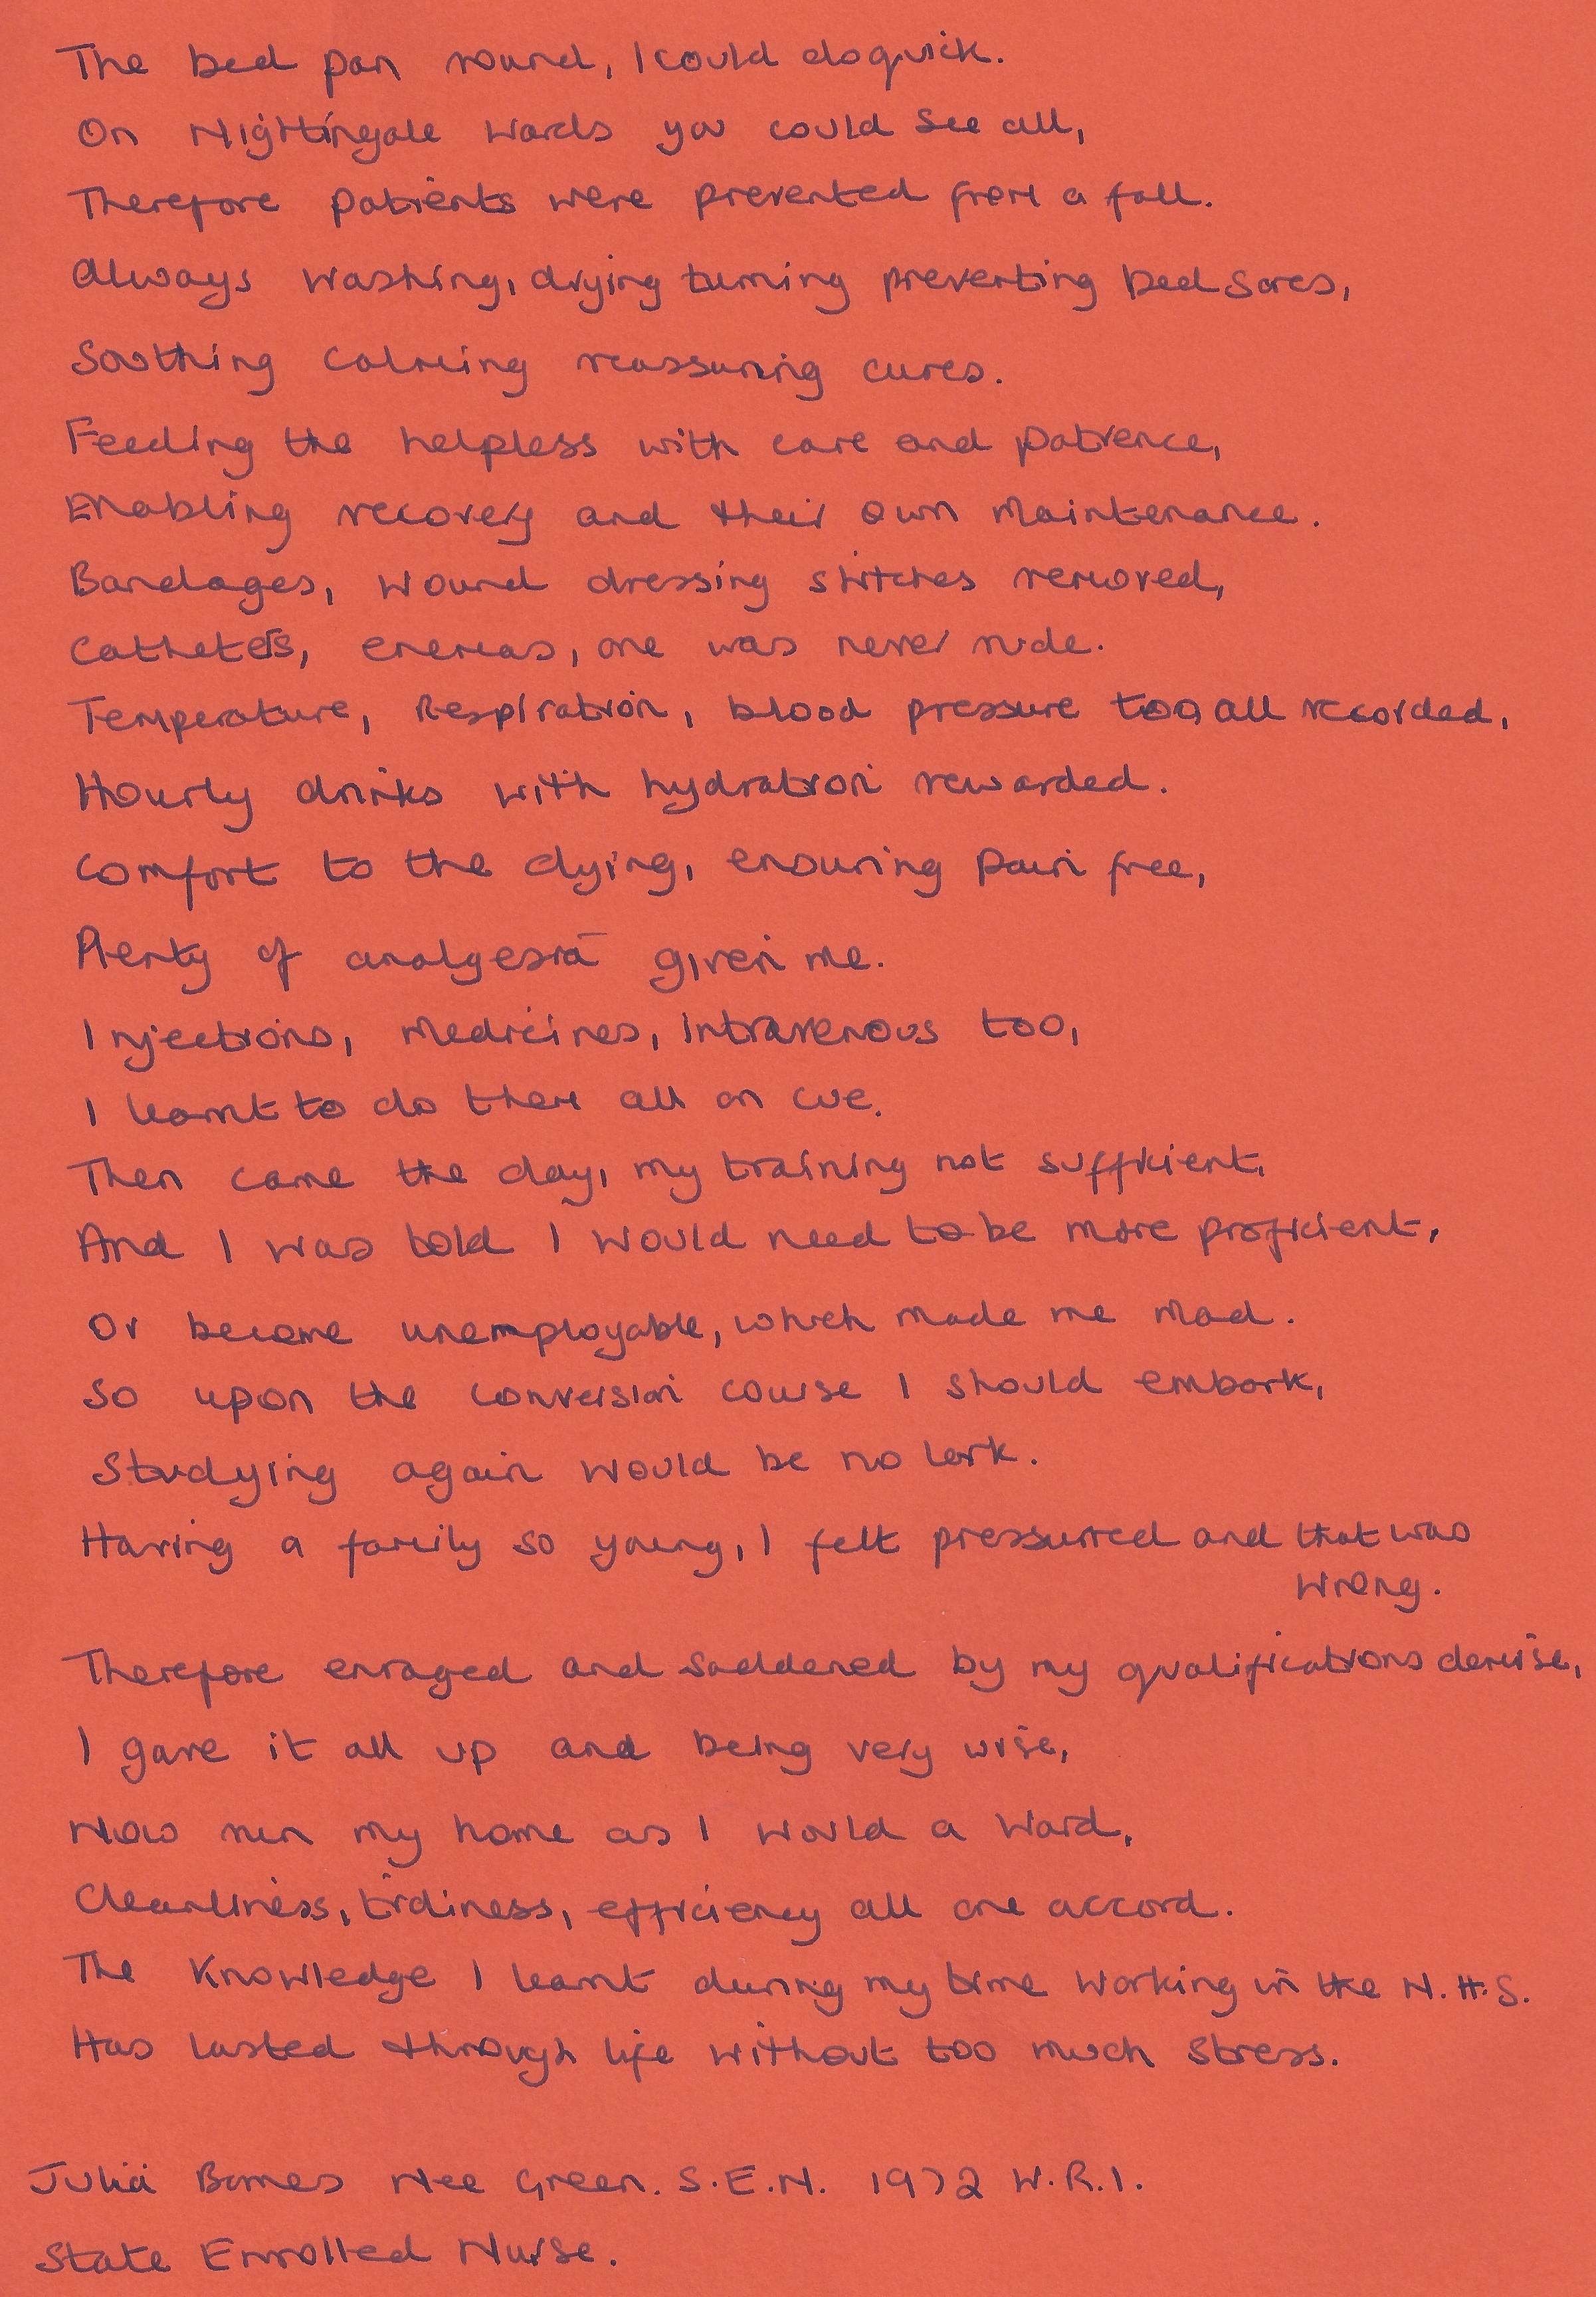 Julia Barnes Poem 2 (2).jpg